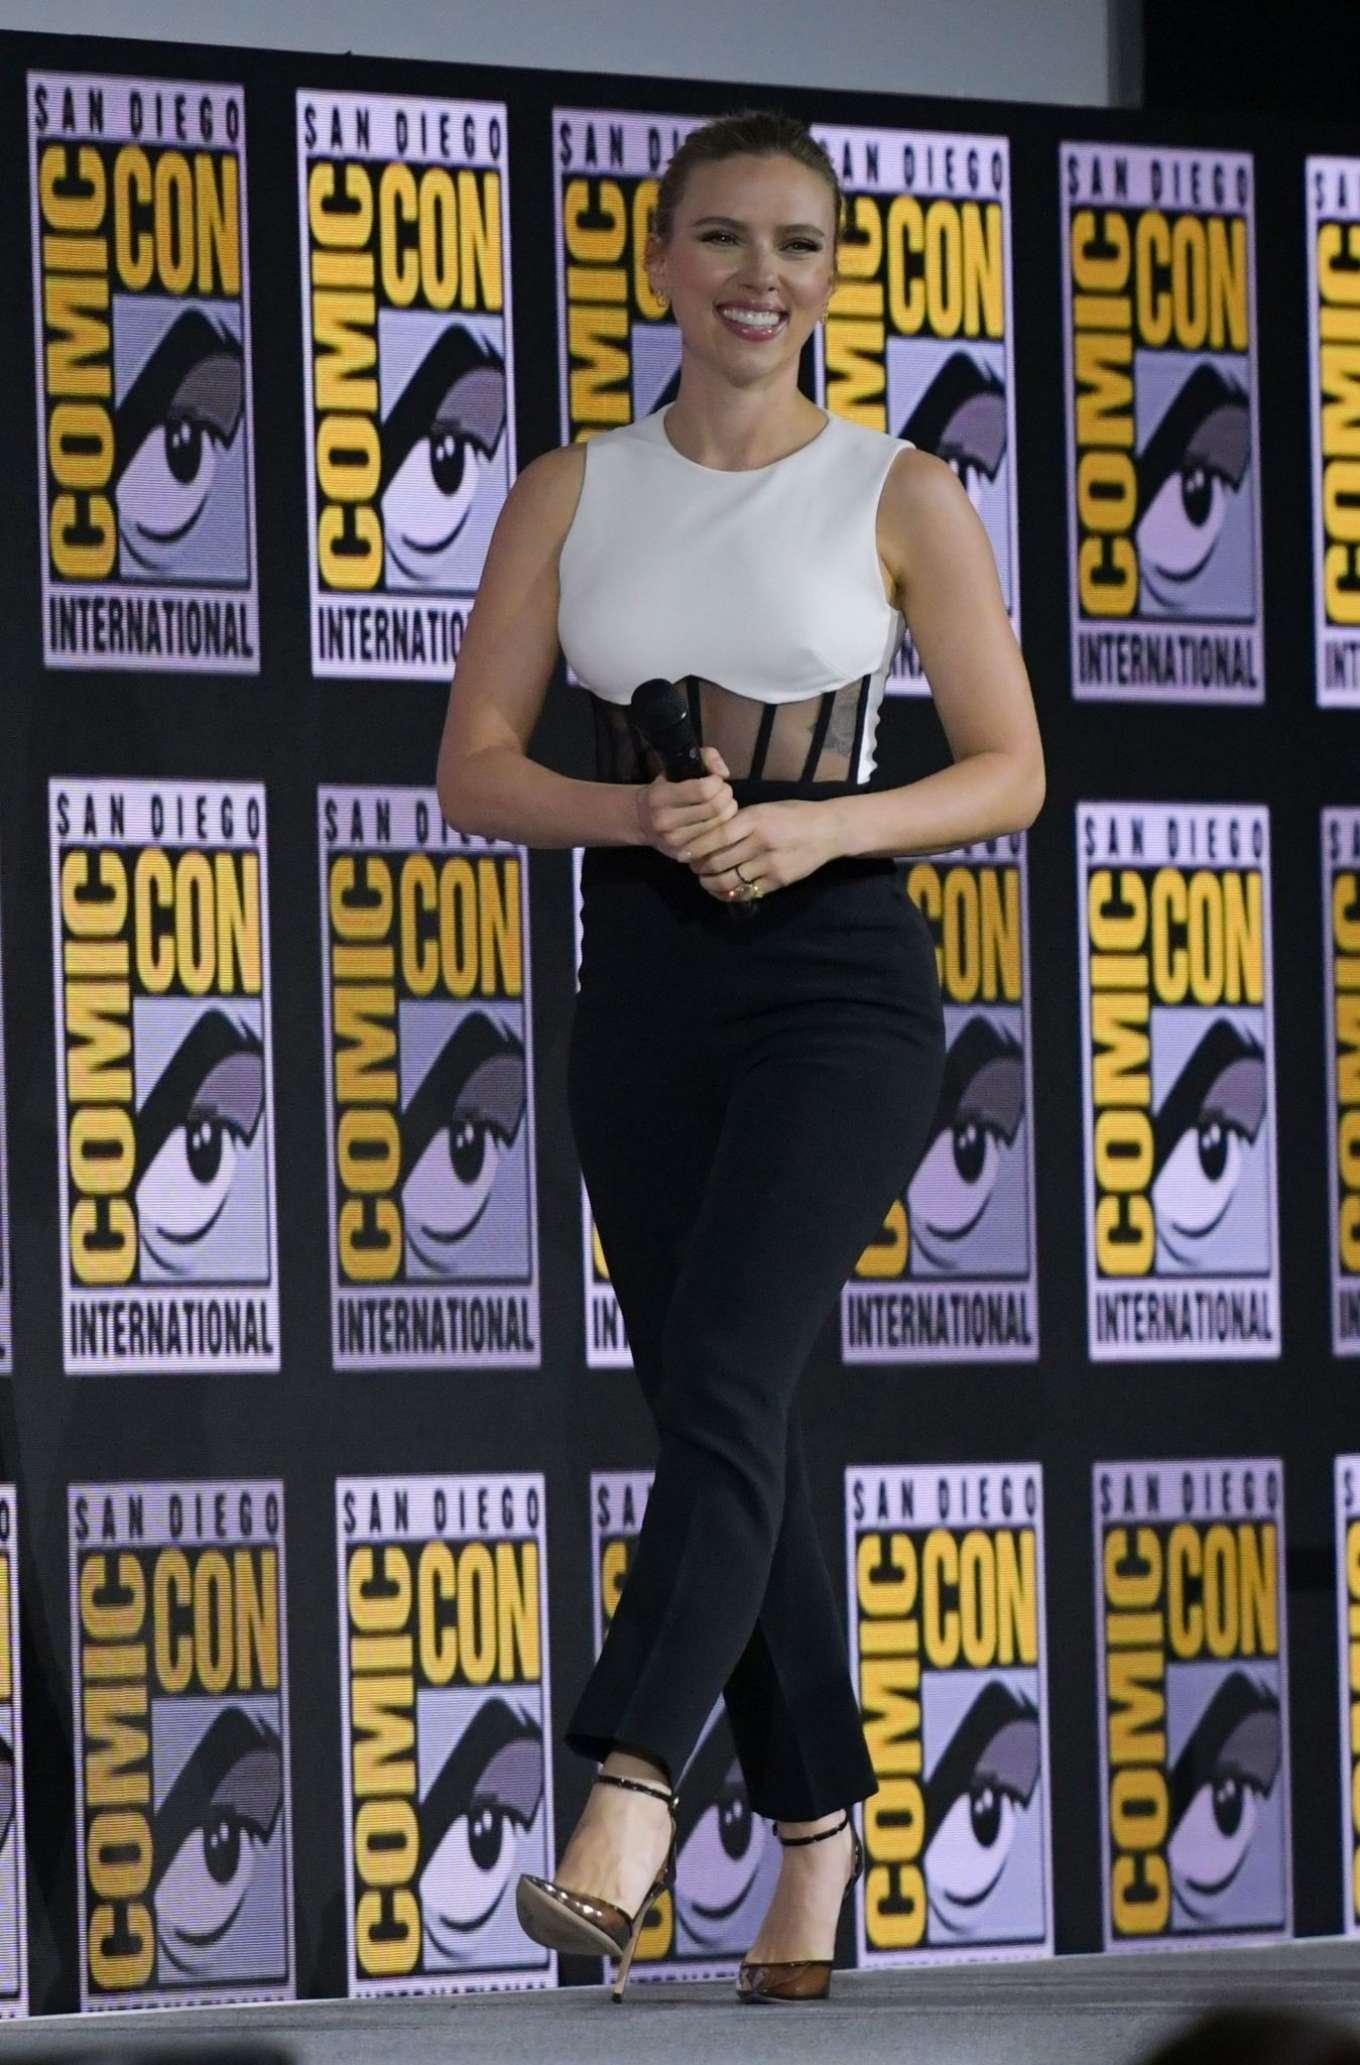 Scarlett Johansson - Marvel Panel at Comic Con San Diego 2019